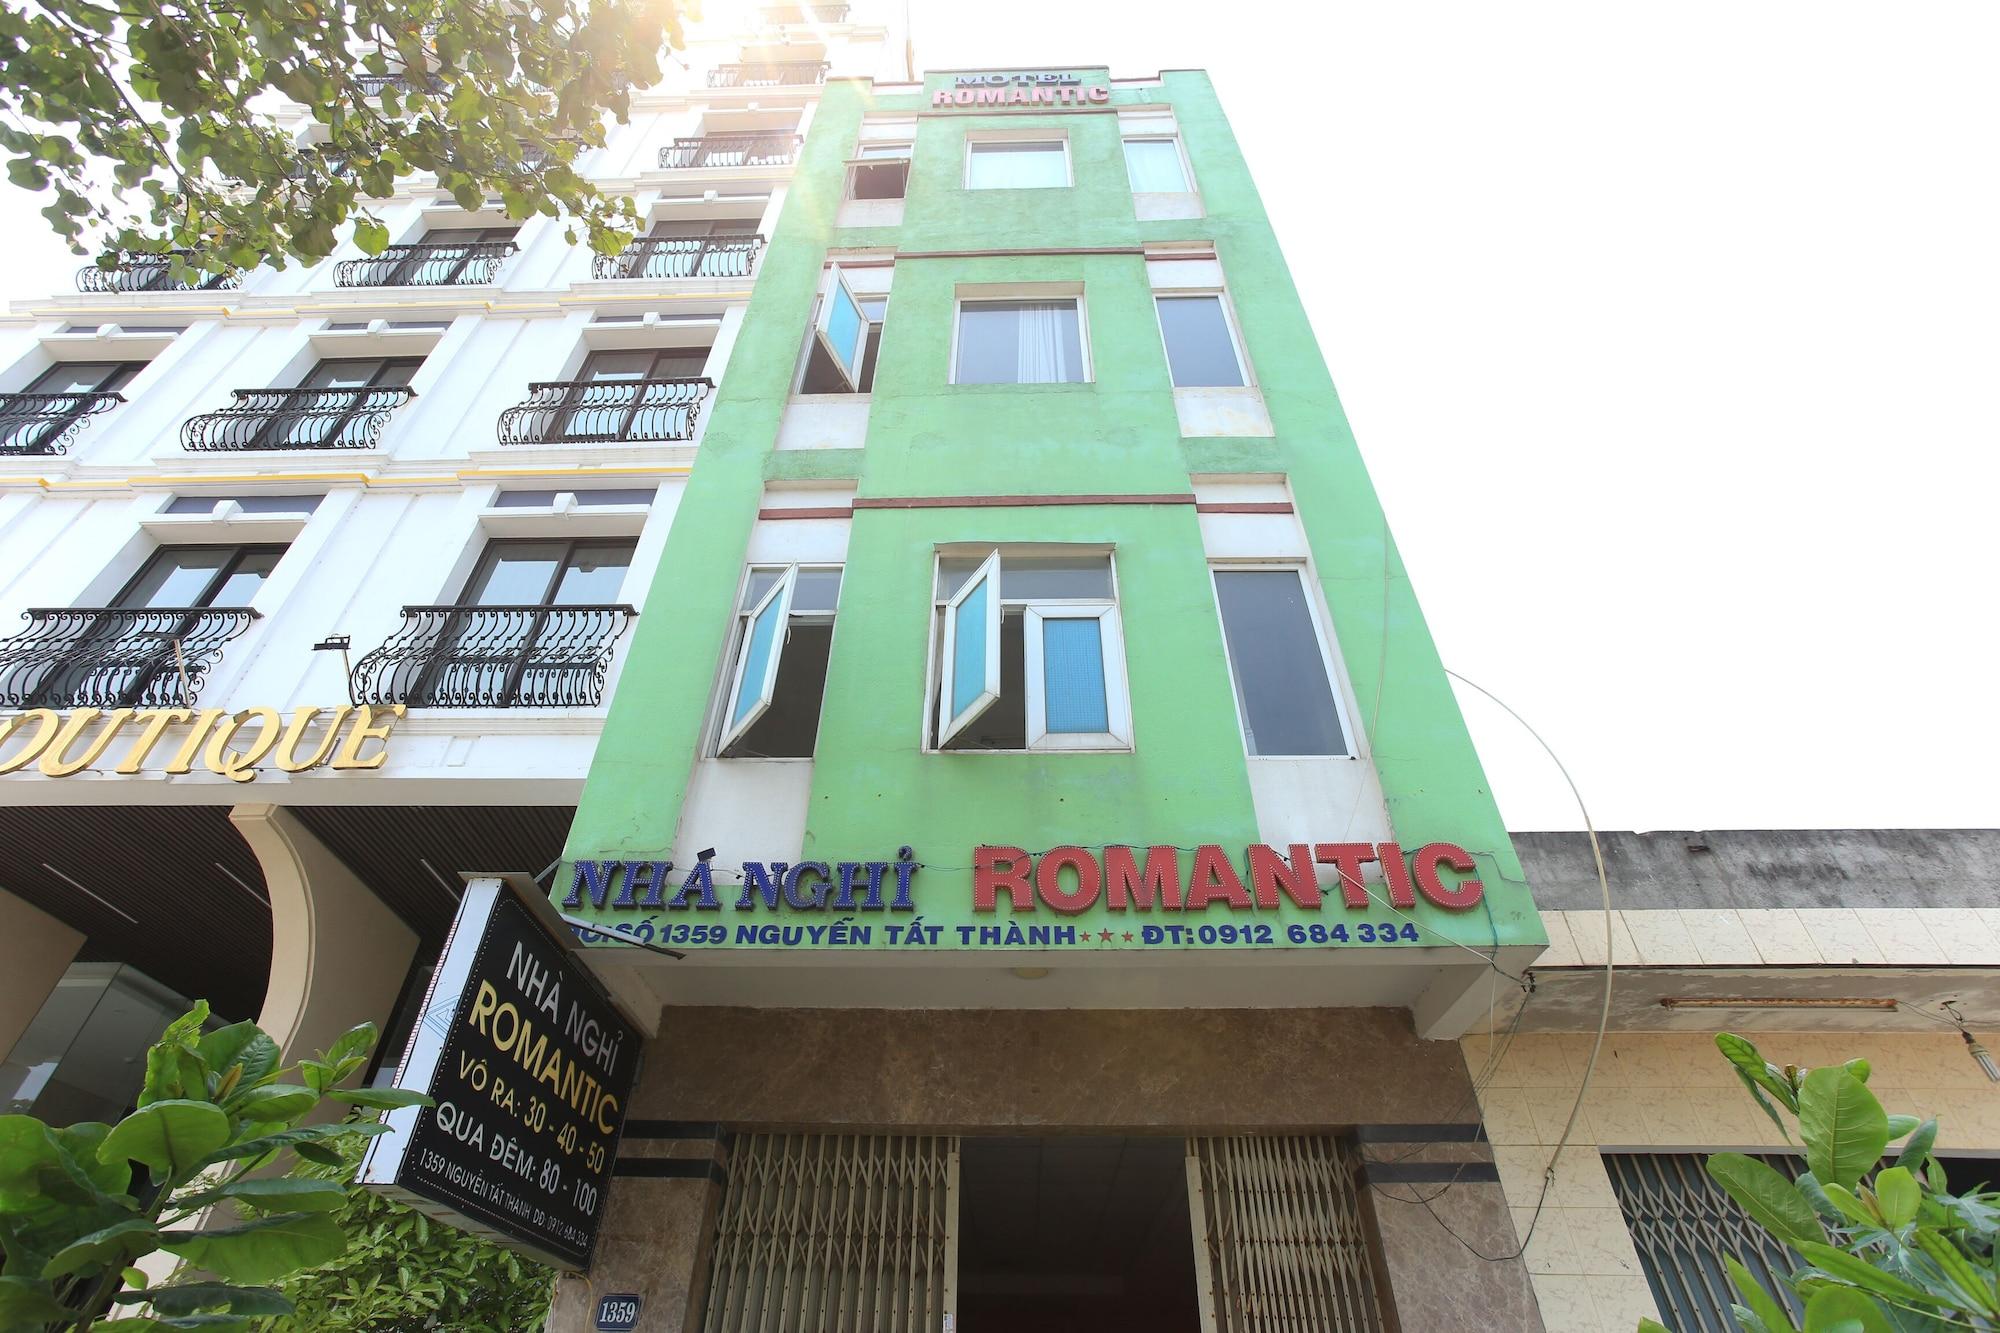 SPOT ON 1115 Romantic Motel, Hải Châu